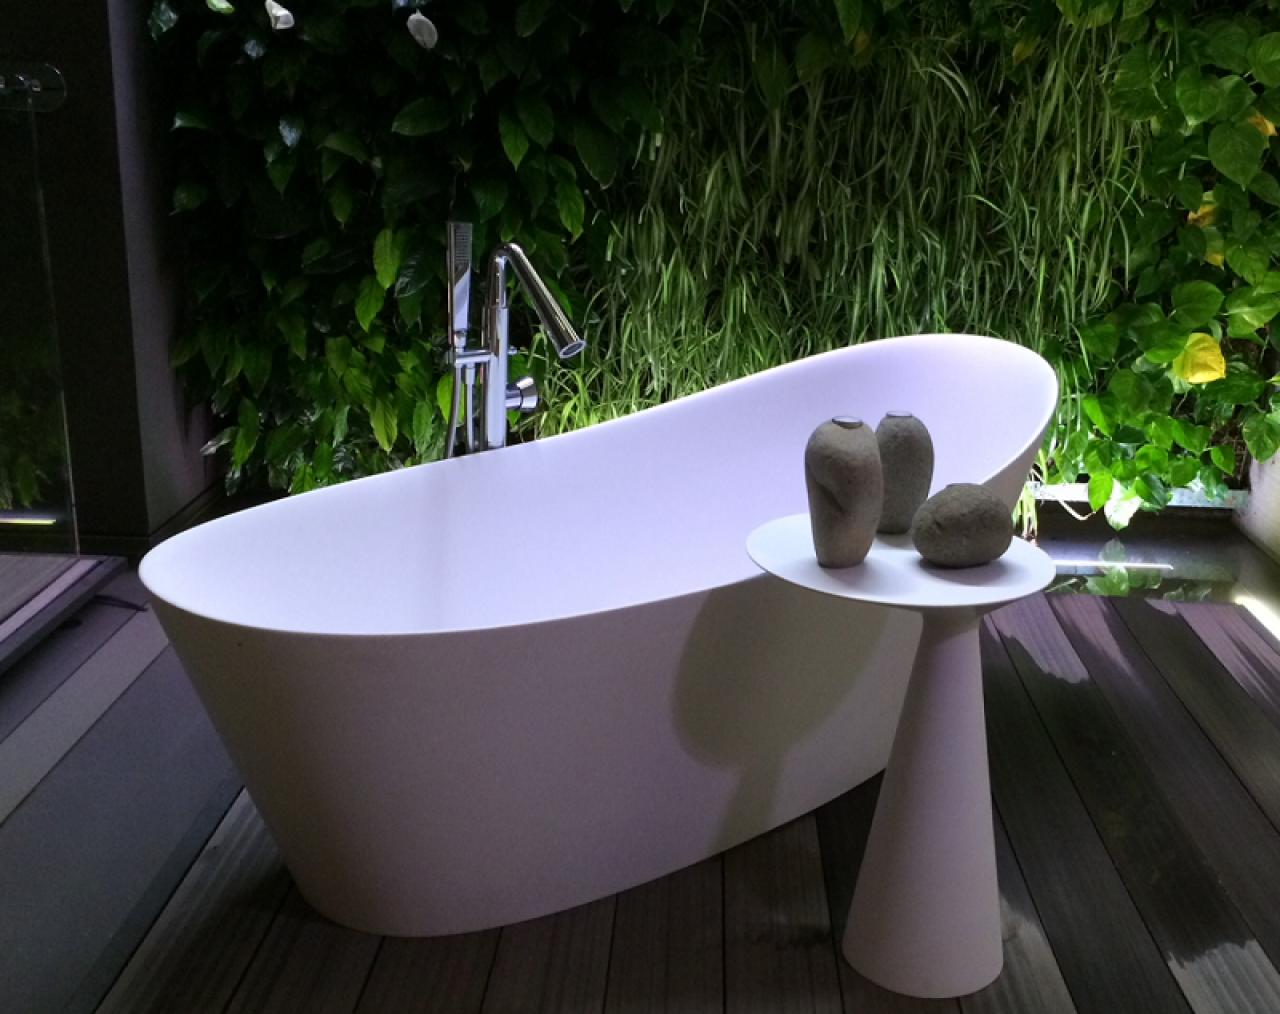 Vasca Da Bagno Freestanding Corian : La vasca da bagno a vicenza fratelli pellizzari